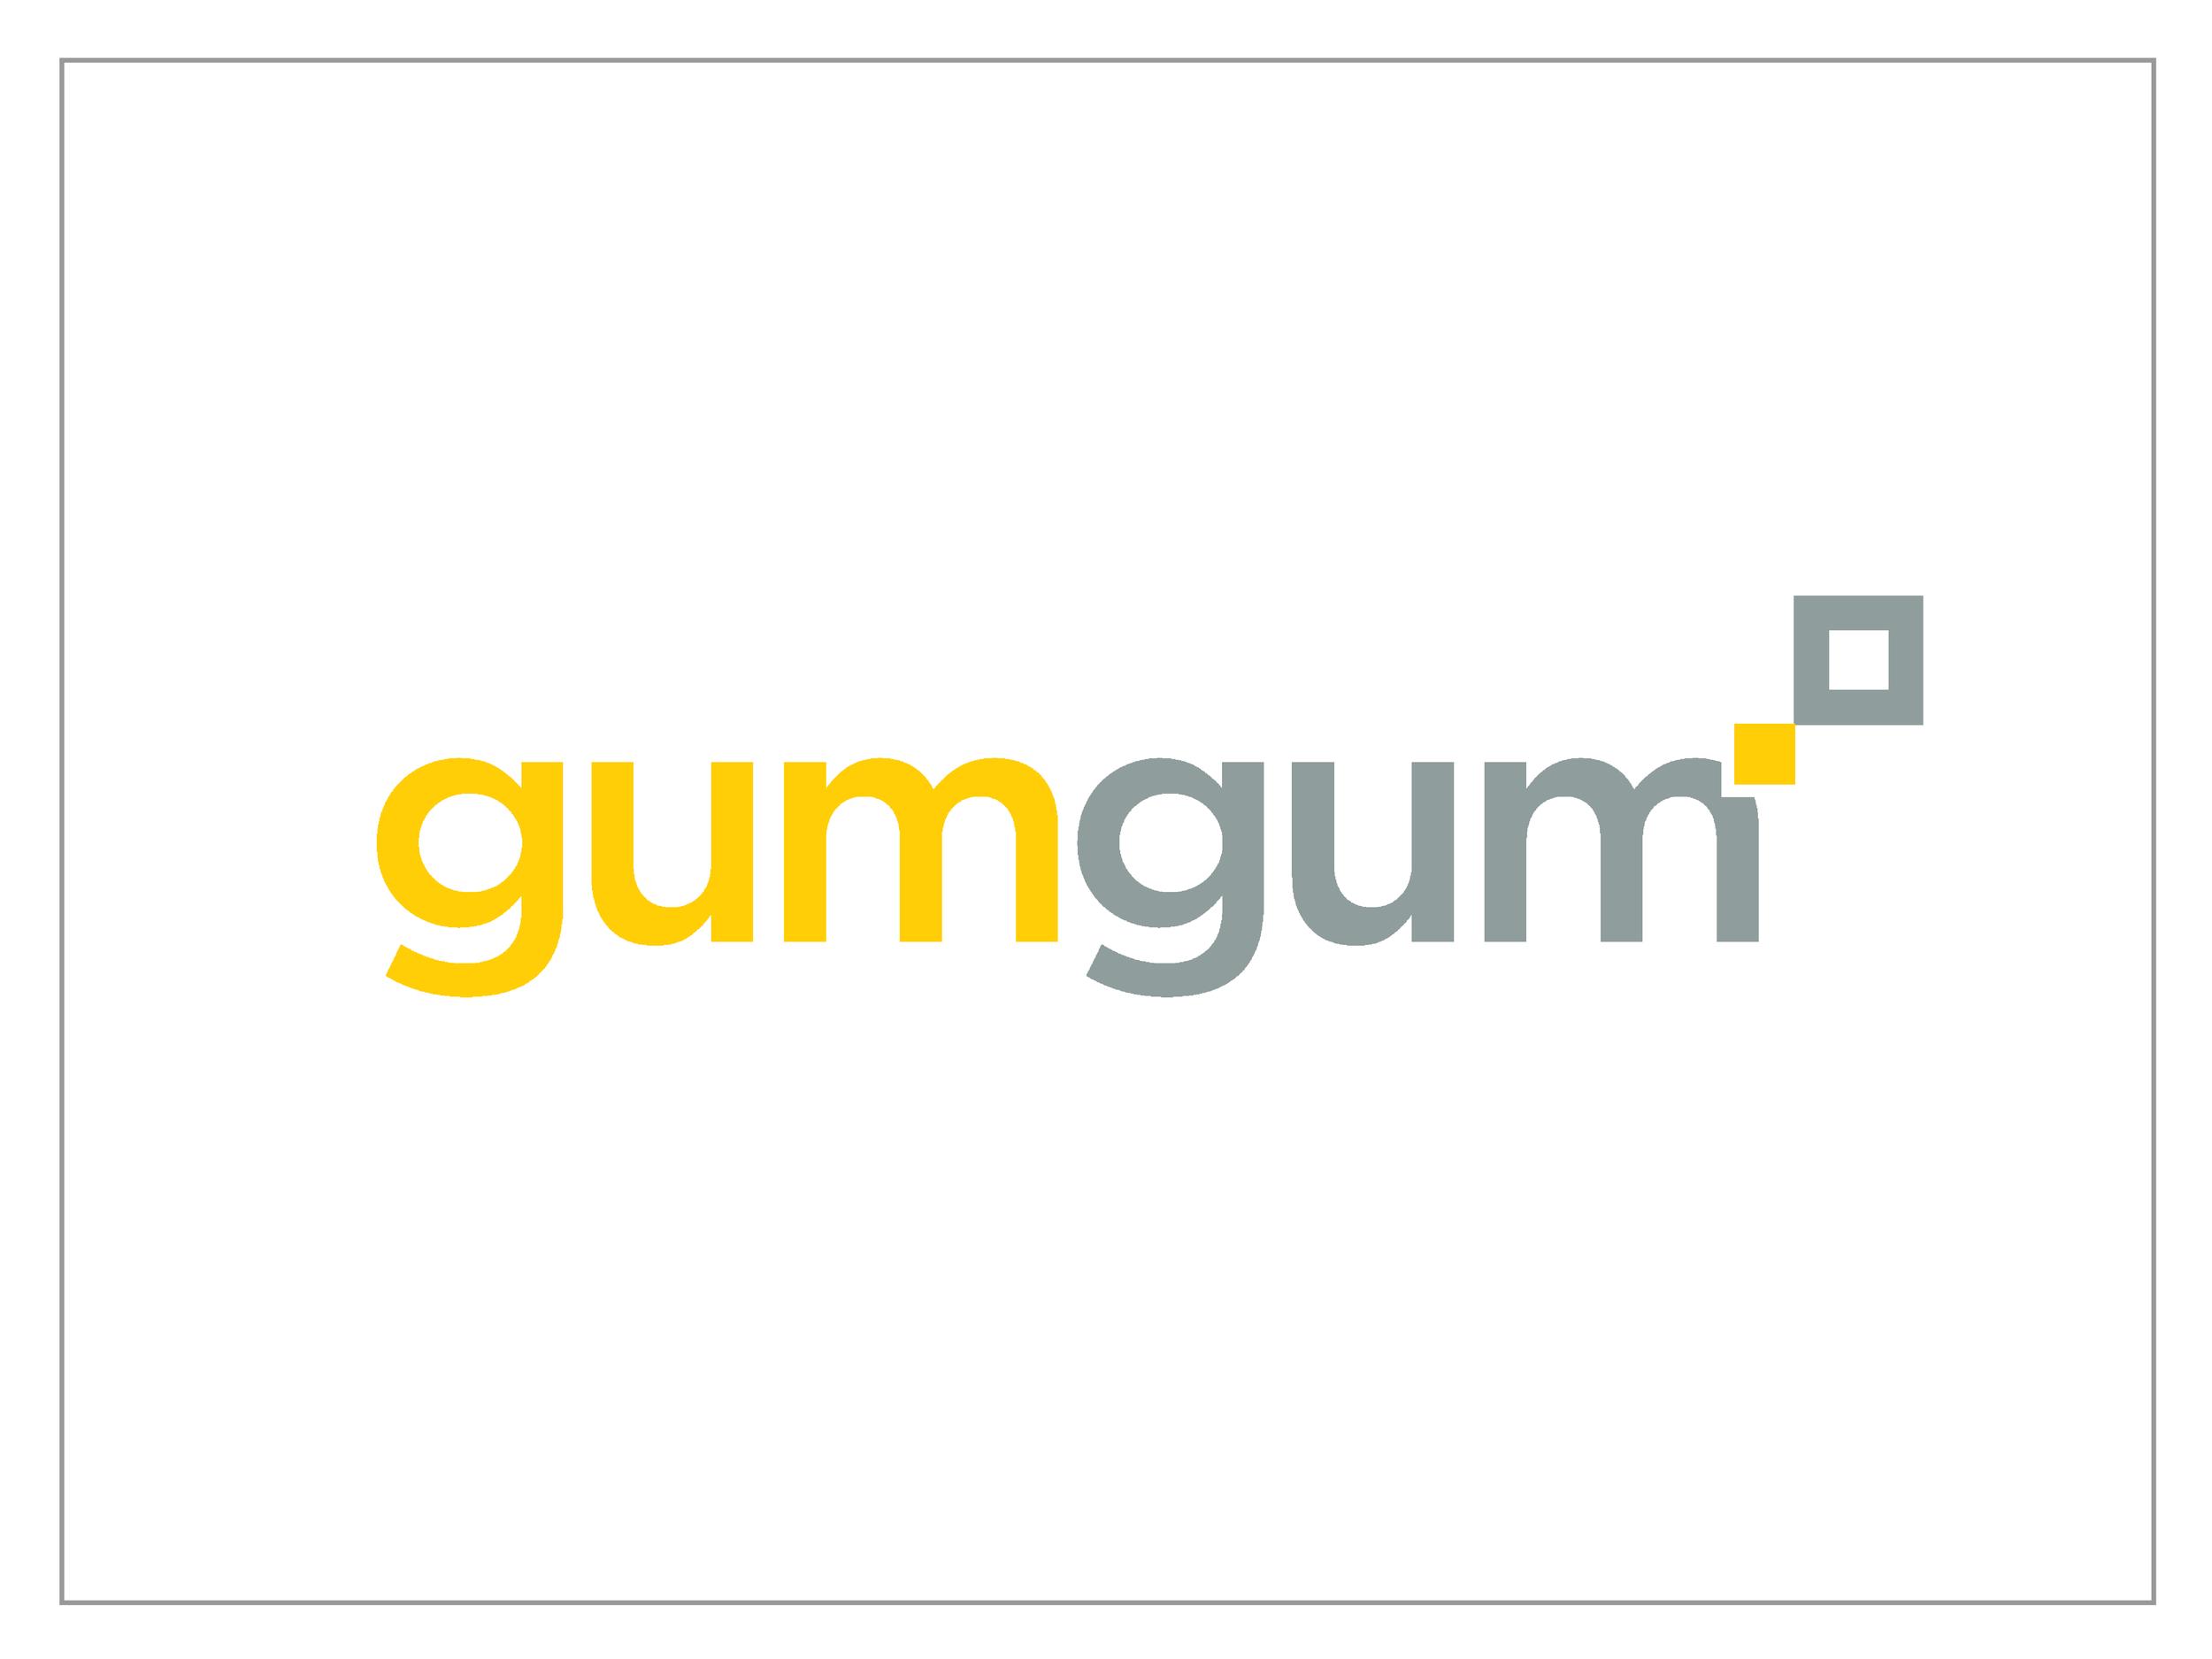 gumgumlogo_Logo.png